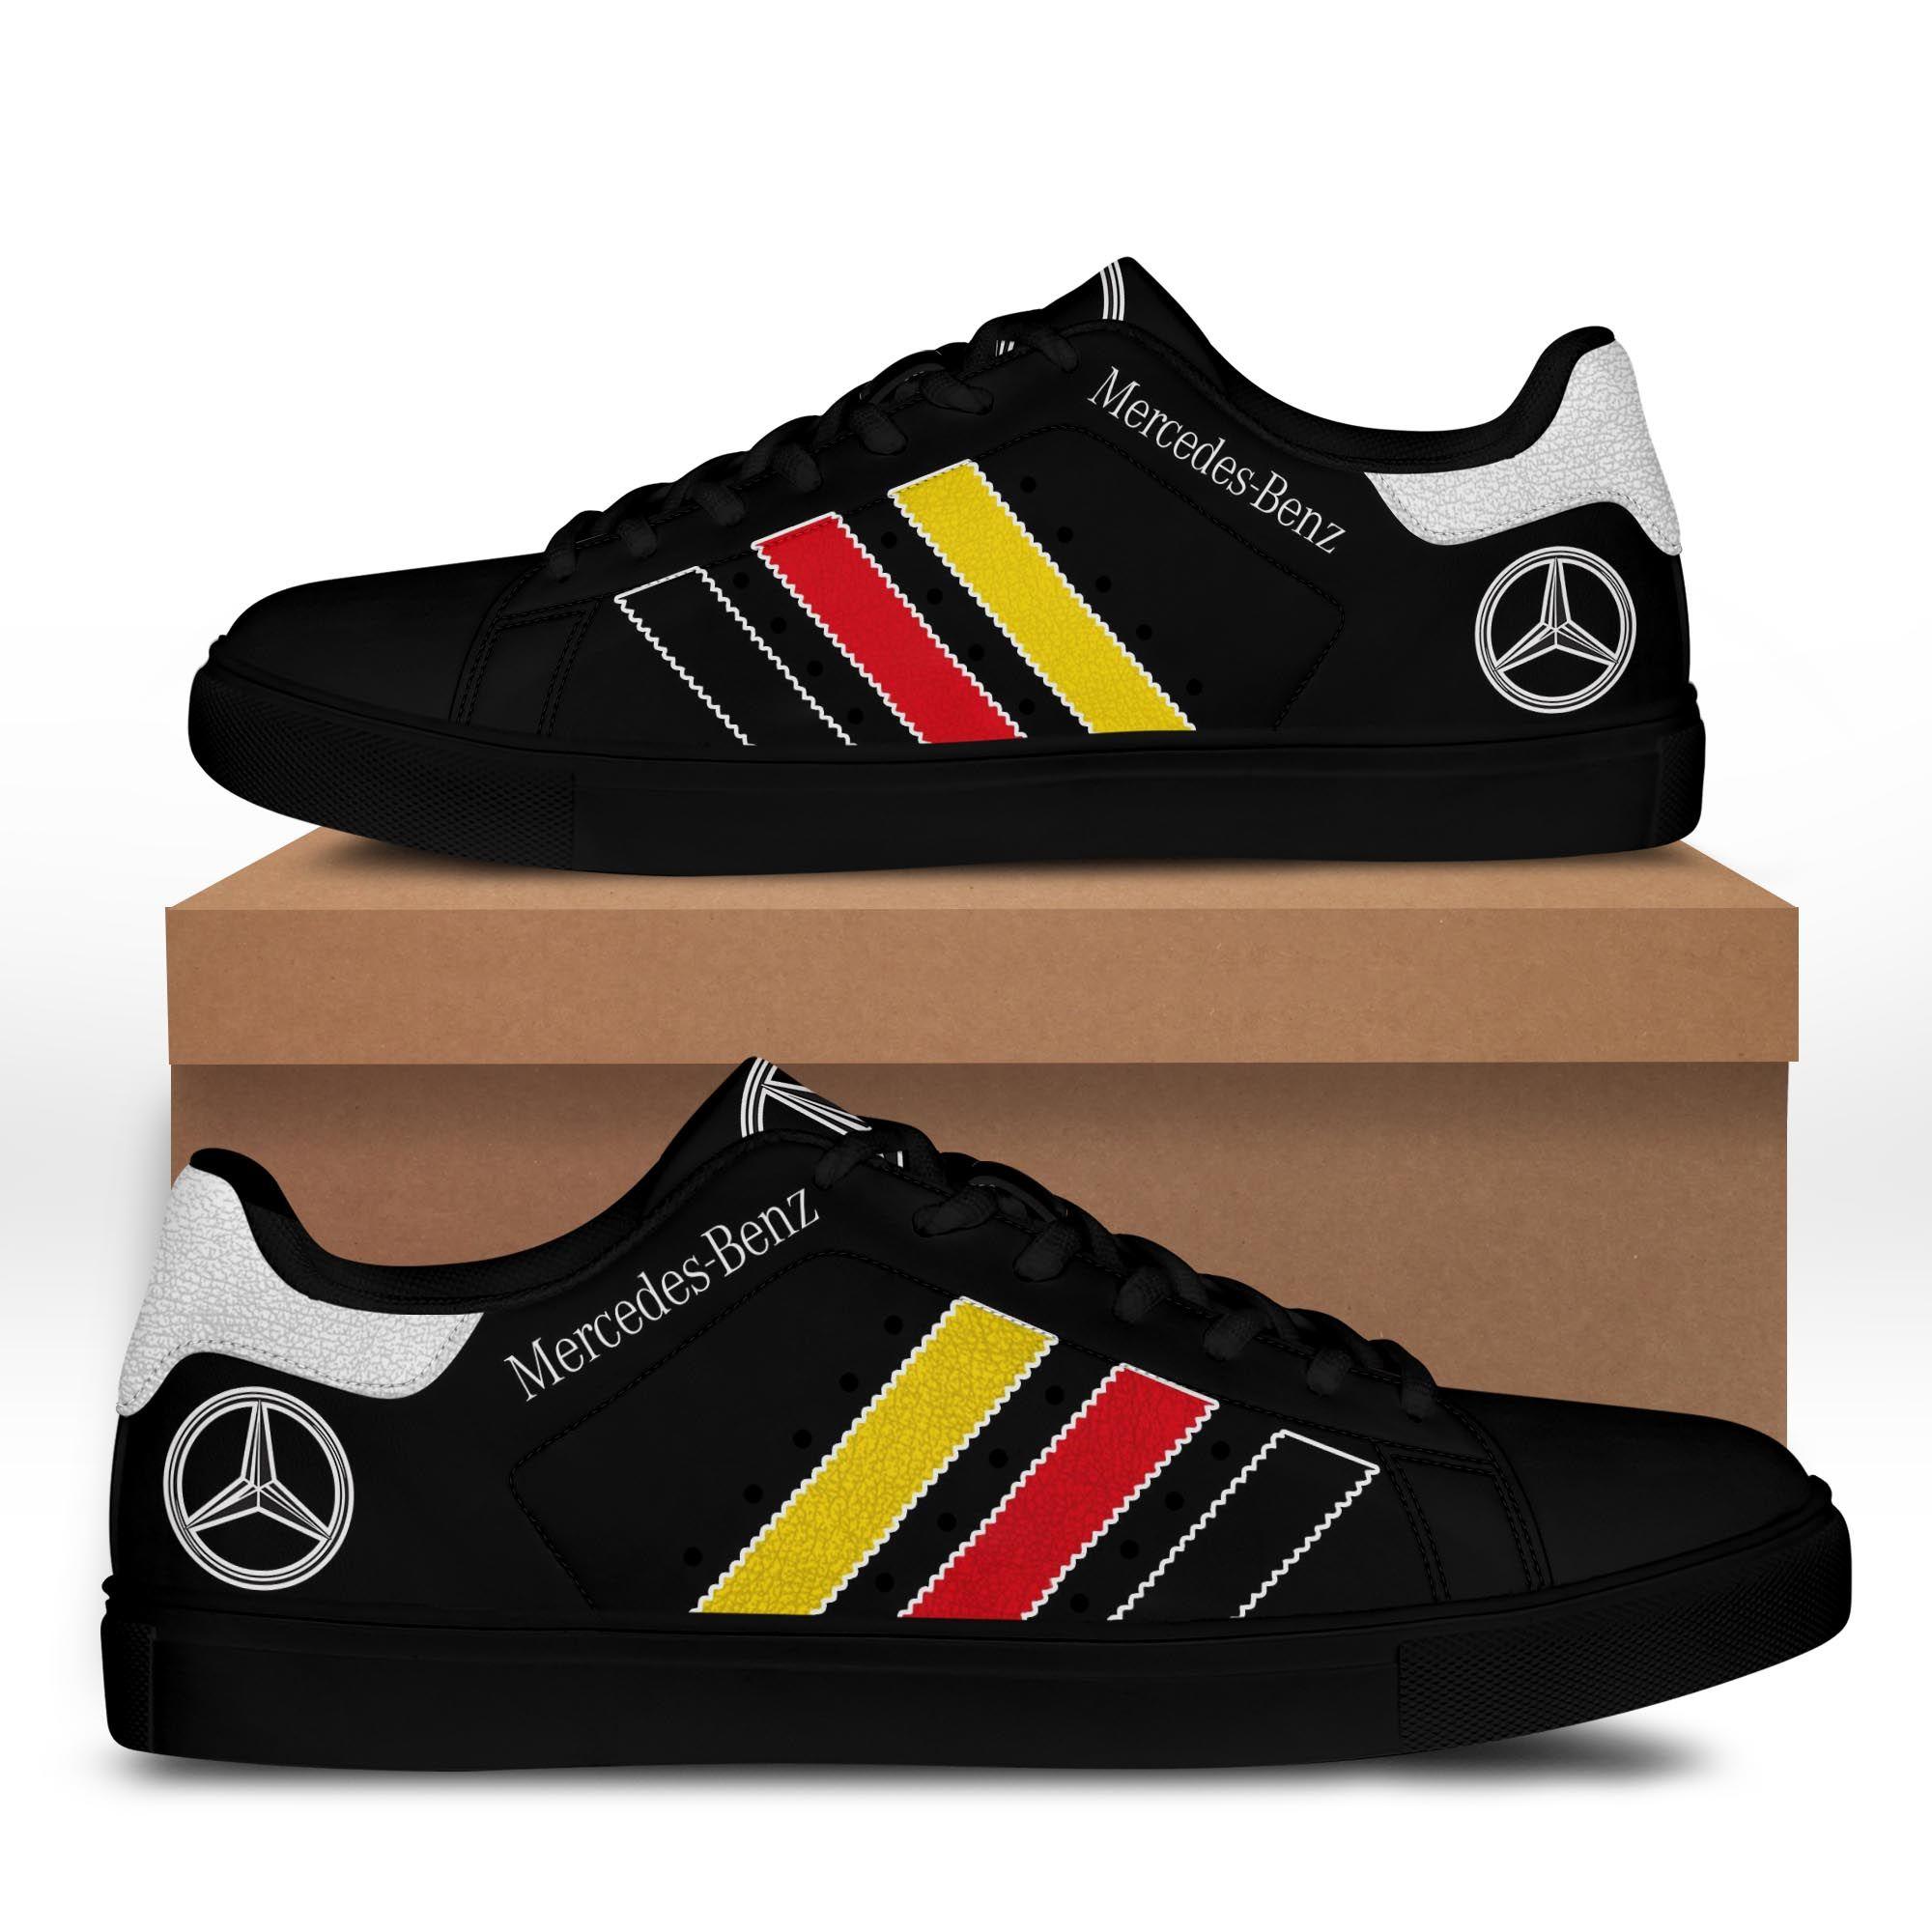 Mercedes Benz Black Stan Smith Shoes Ver 2